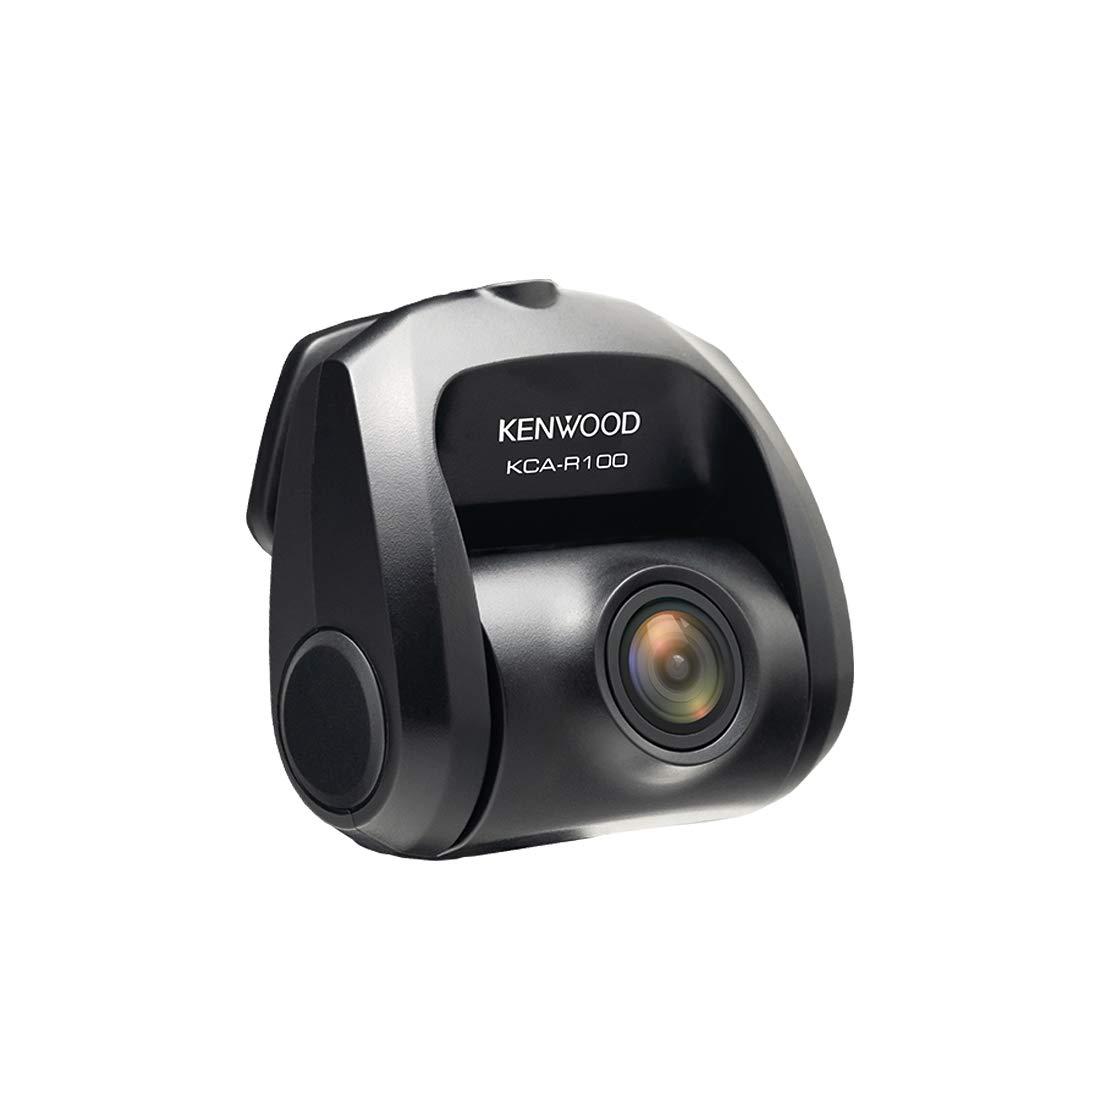 Kenwood DRV-A601WDP Dual Dash Cam